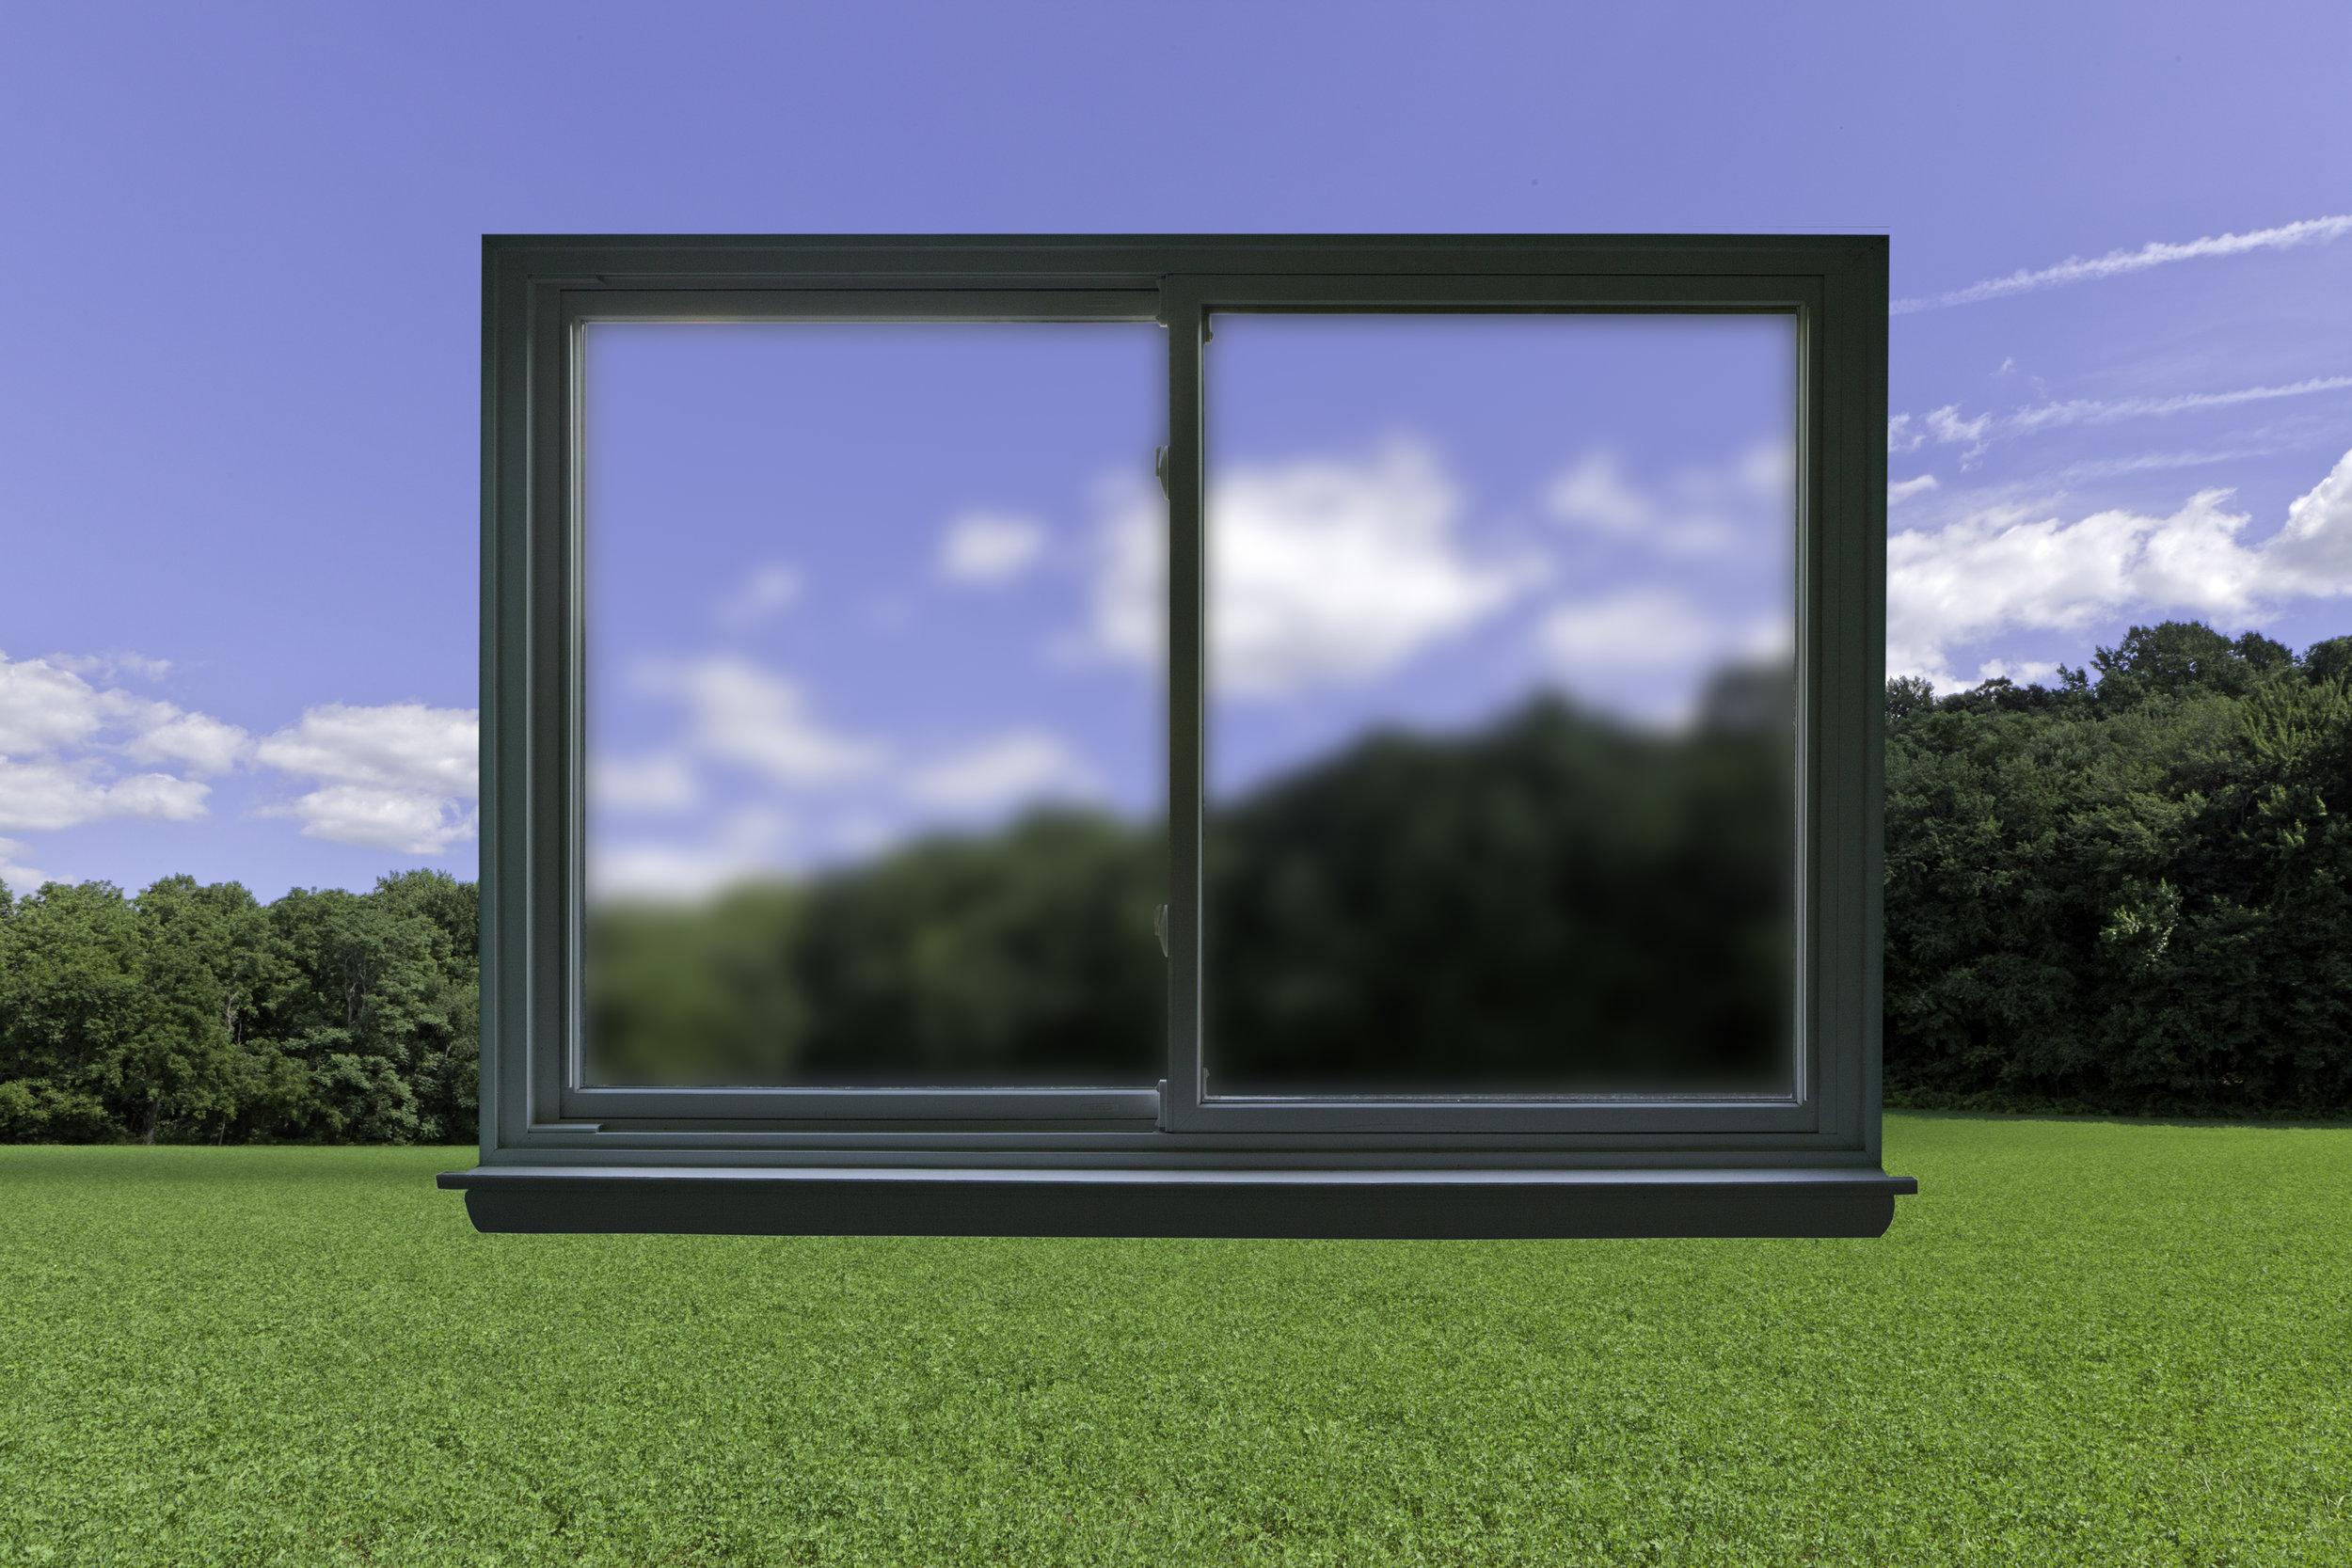 Windows As Eyes, 2018, archival pigment print